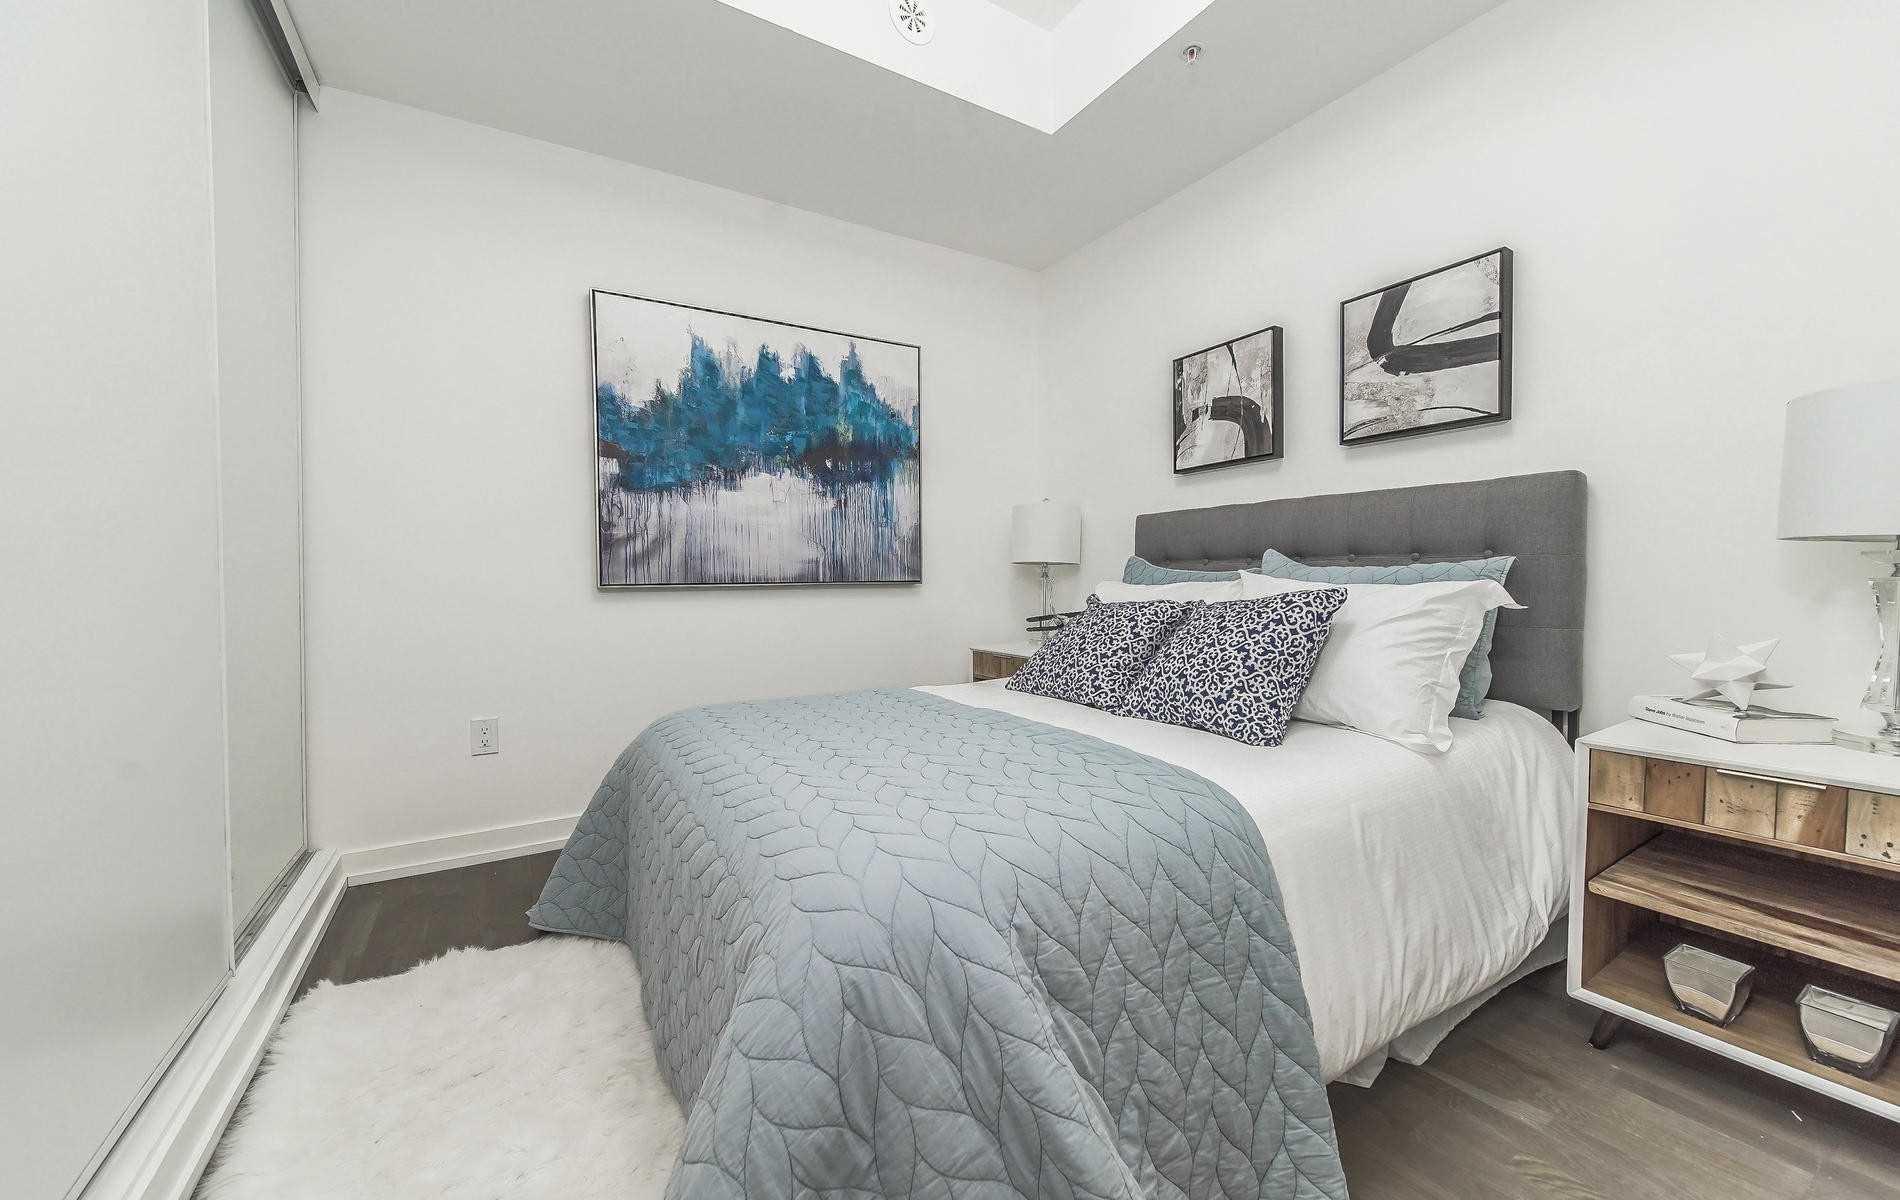 Photo 12: Photos: Th 11 150 Broadview Avenue in Toronto: South Riverdale Condo for sale (Toronto E01)  : MLS®# E4519038